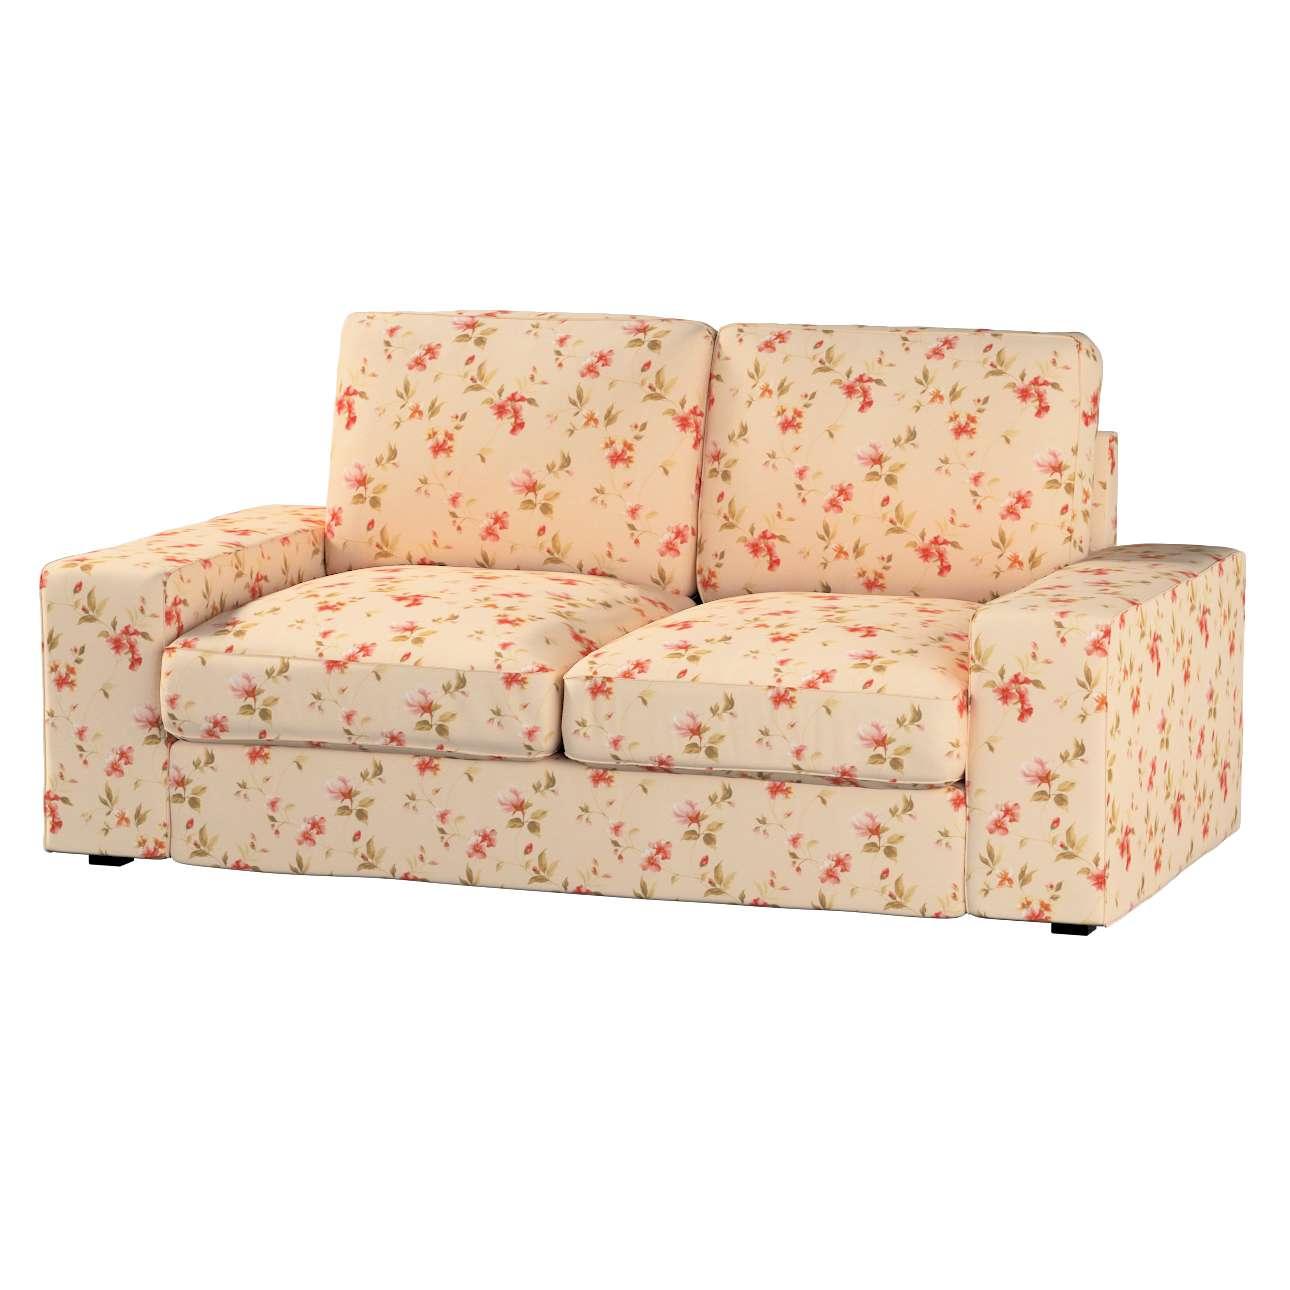 Kivik 2-Sitzer Sofabezug Sofa Kivik 2-Sitzer von der Kollektion Londres, Stoff: 124-05